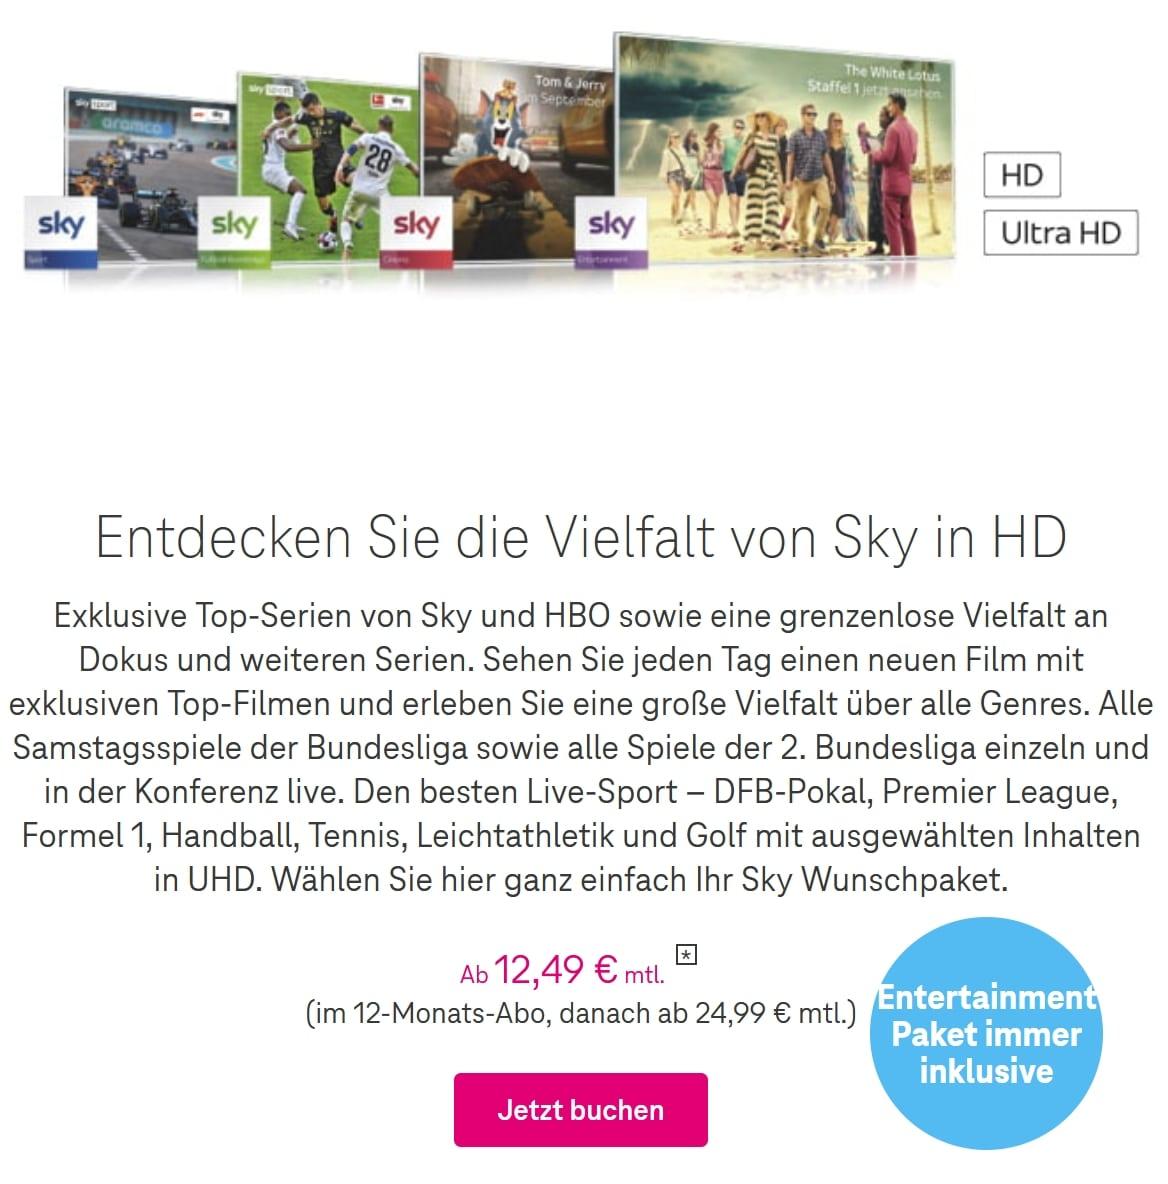 sky-magenta-tv-iptv-angebot